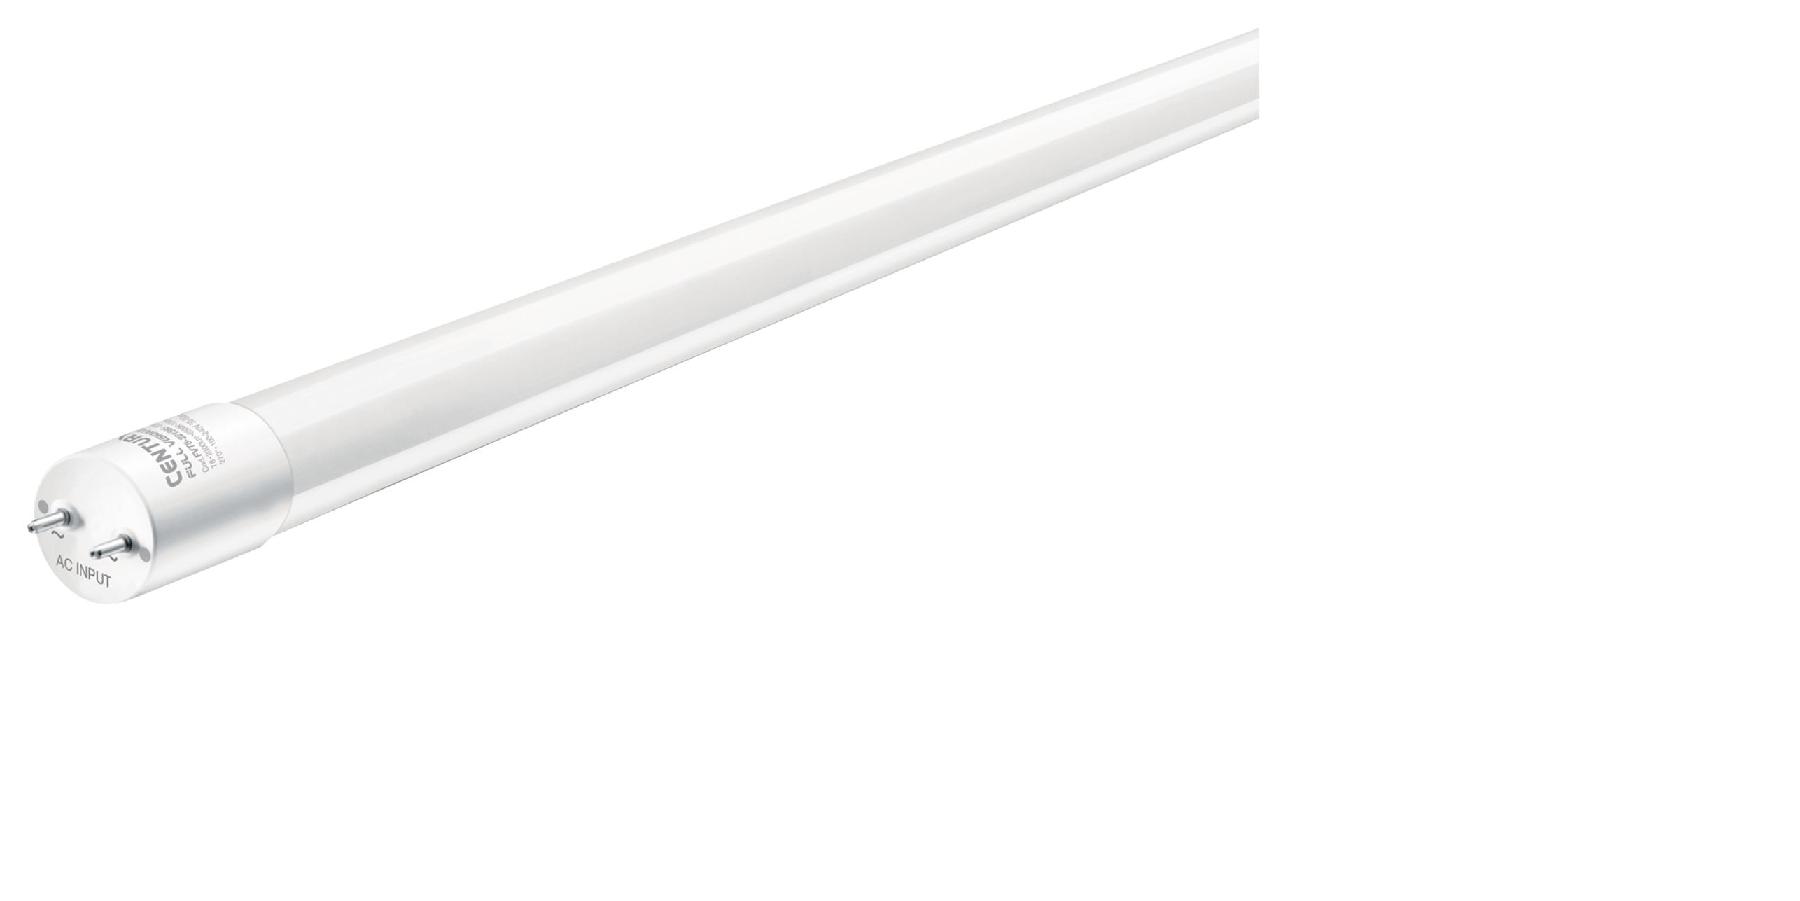 LED trubice 9W 60cm, 900lm, 4000K, T8, CENTURY